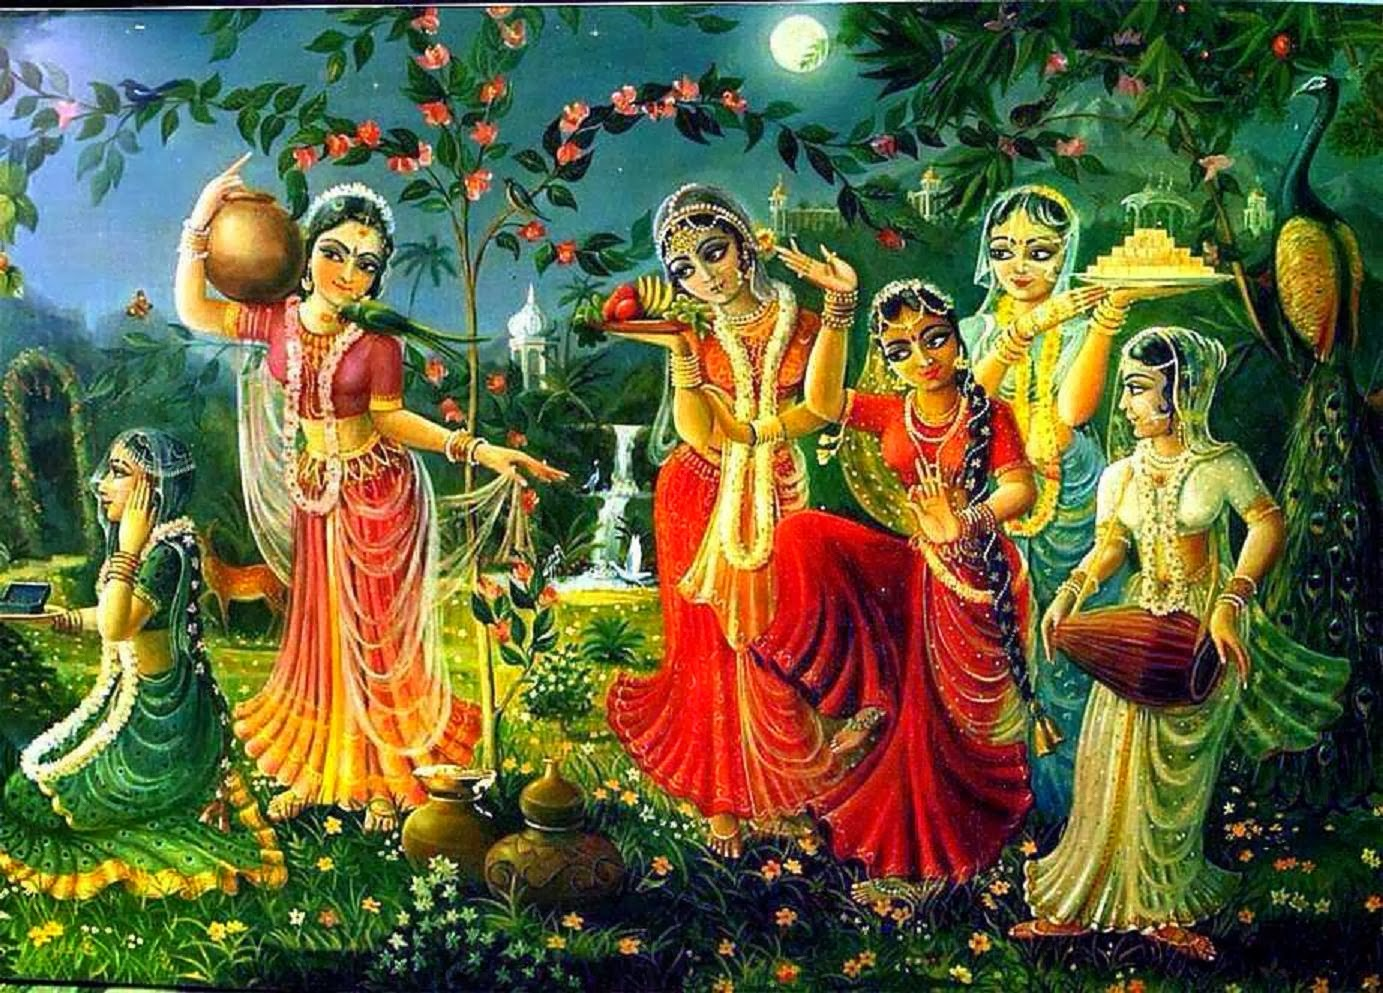 3d Radha Krishna Wallpaper Download The Pro Kanishta Siddha Pranali Campaign Part 1 Vina